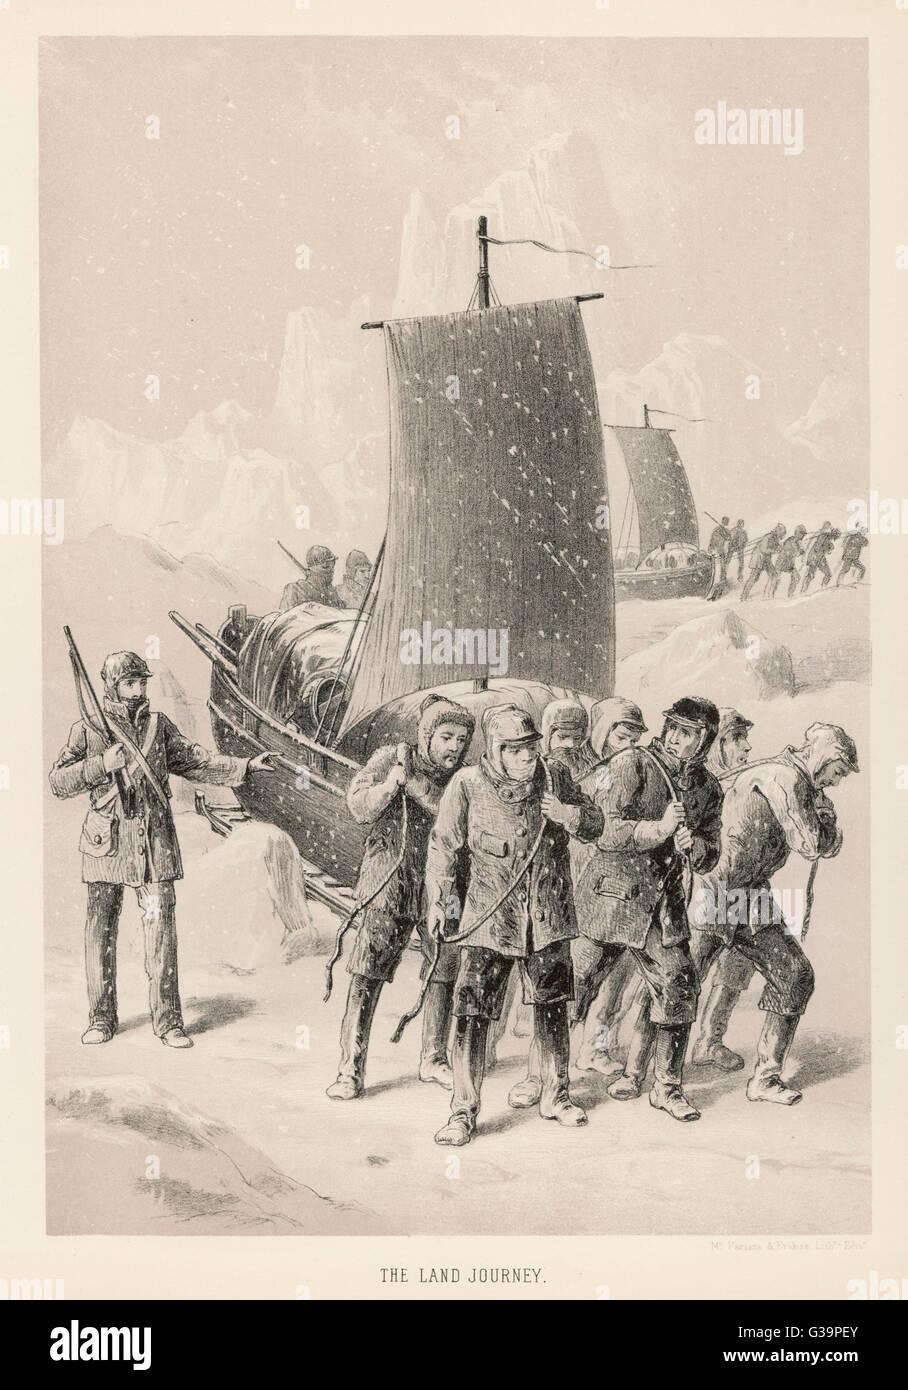 Thomas Simpson's land journey         Date: 1836-39 - Stock Image